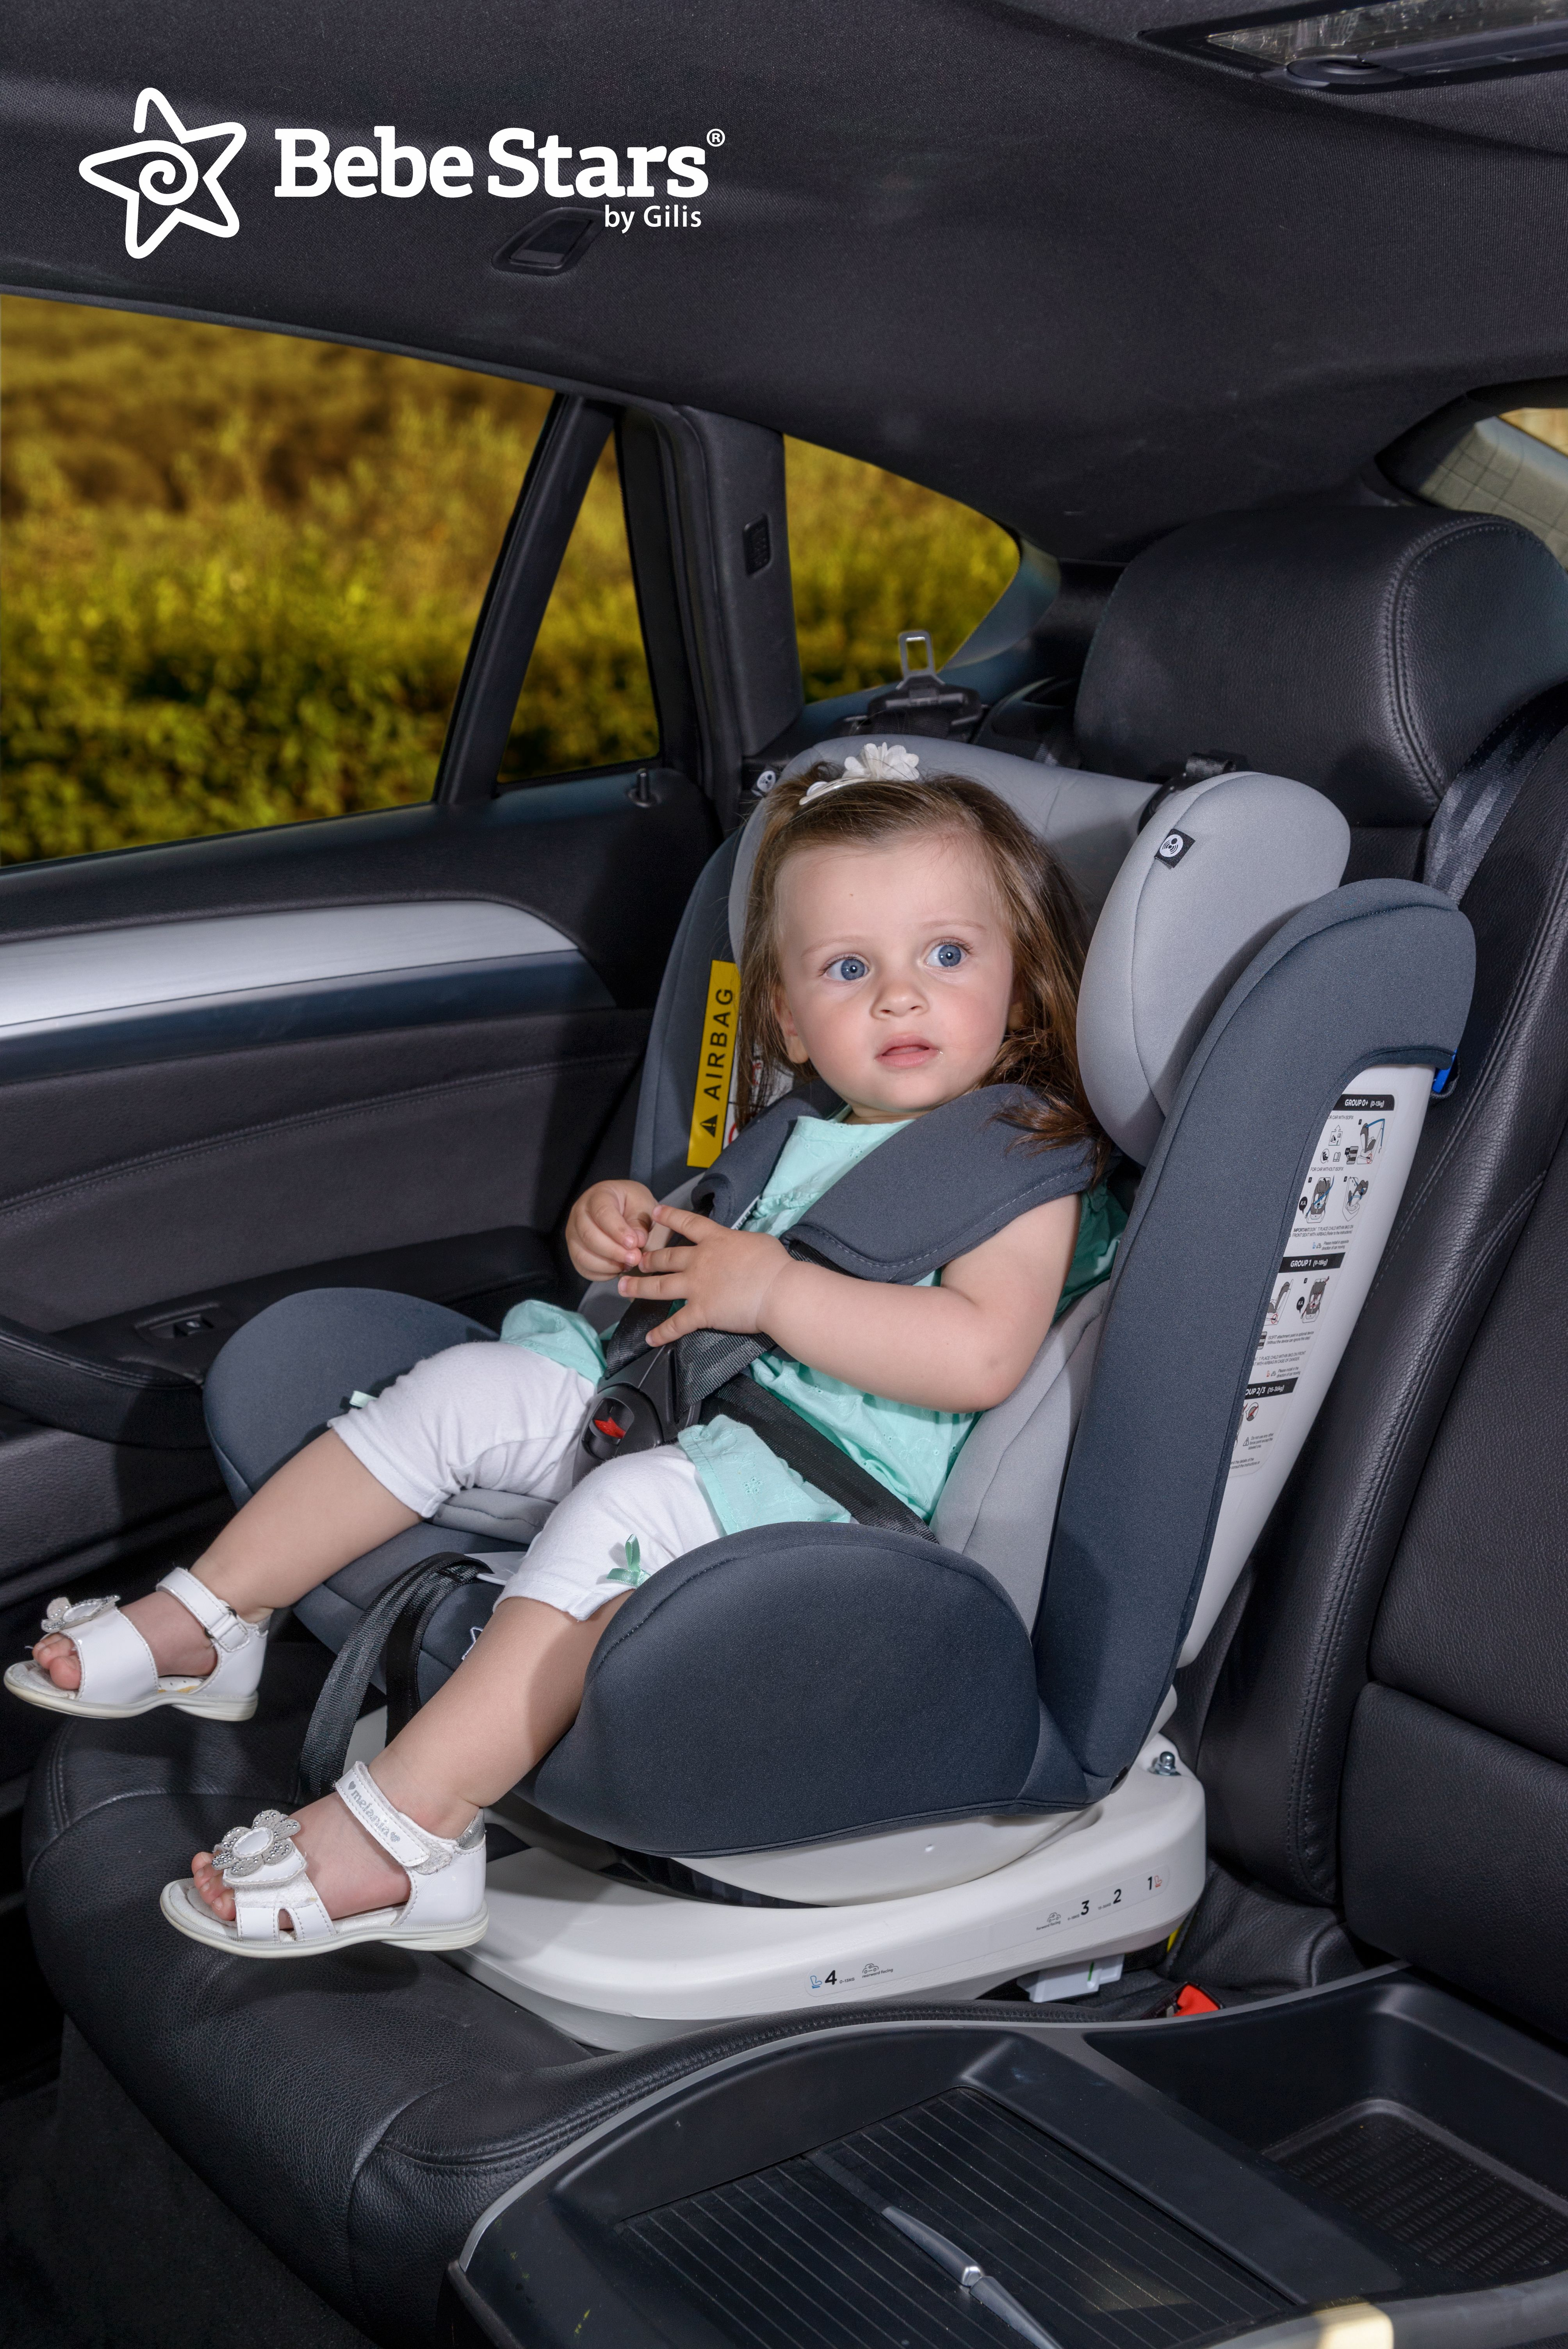 Levante 0 36 Kg In 2020 Baby Car Seats Baby Car Baby Strollers